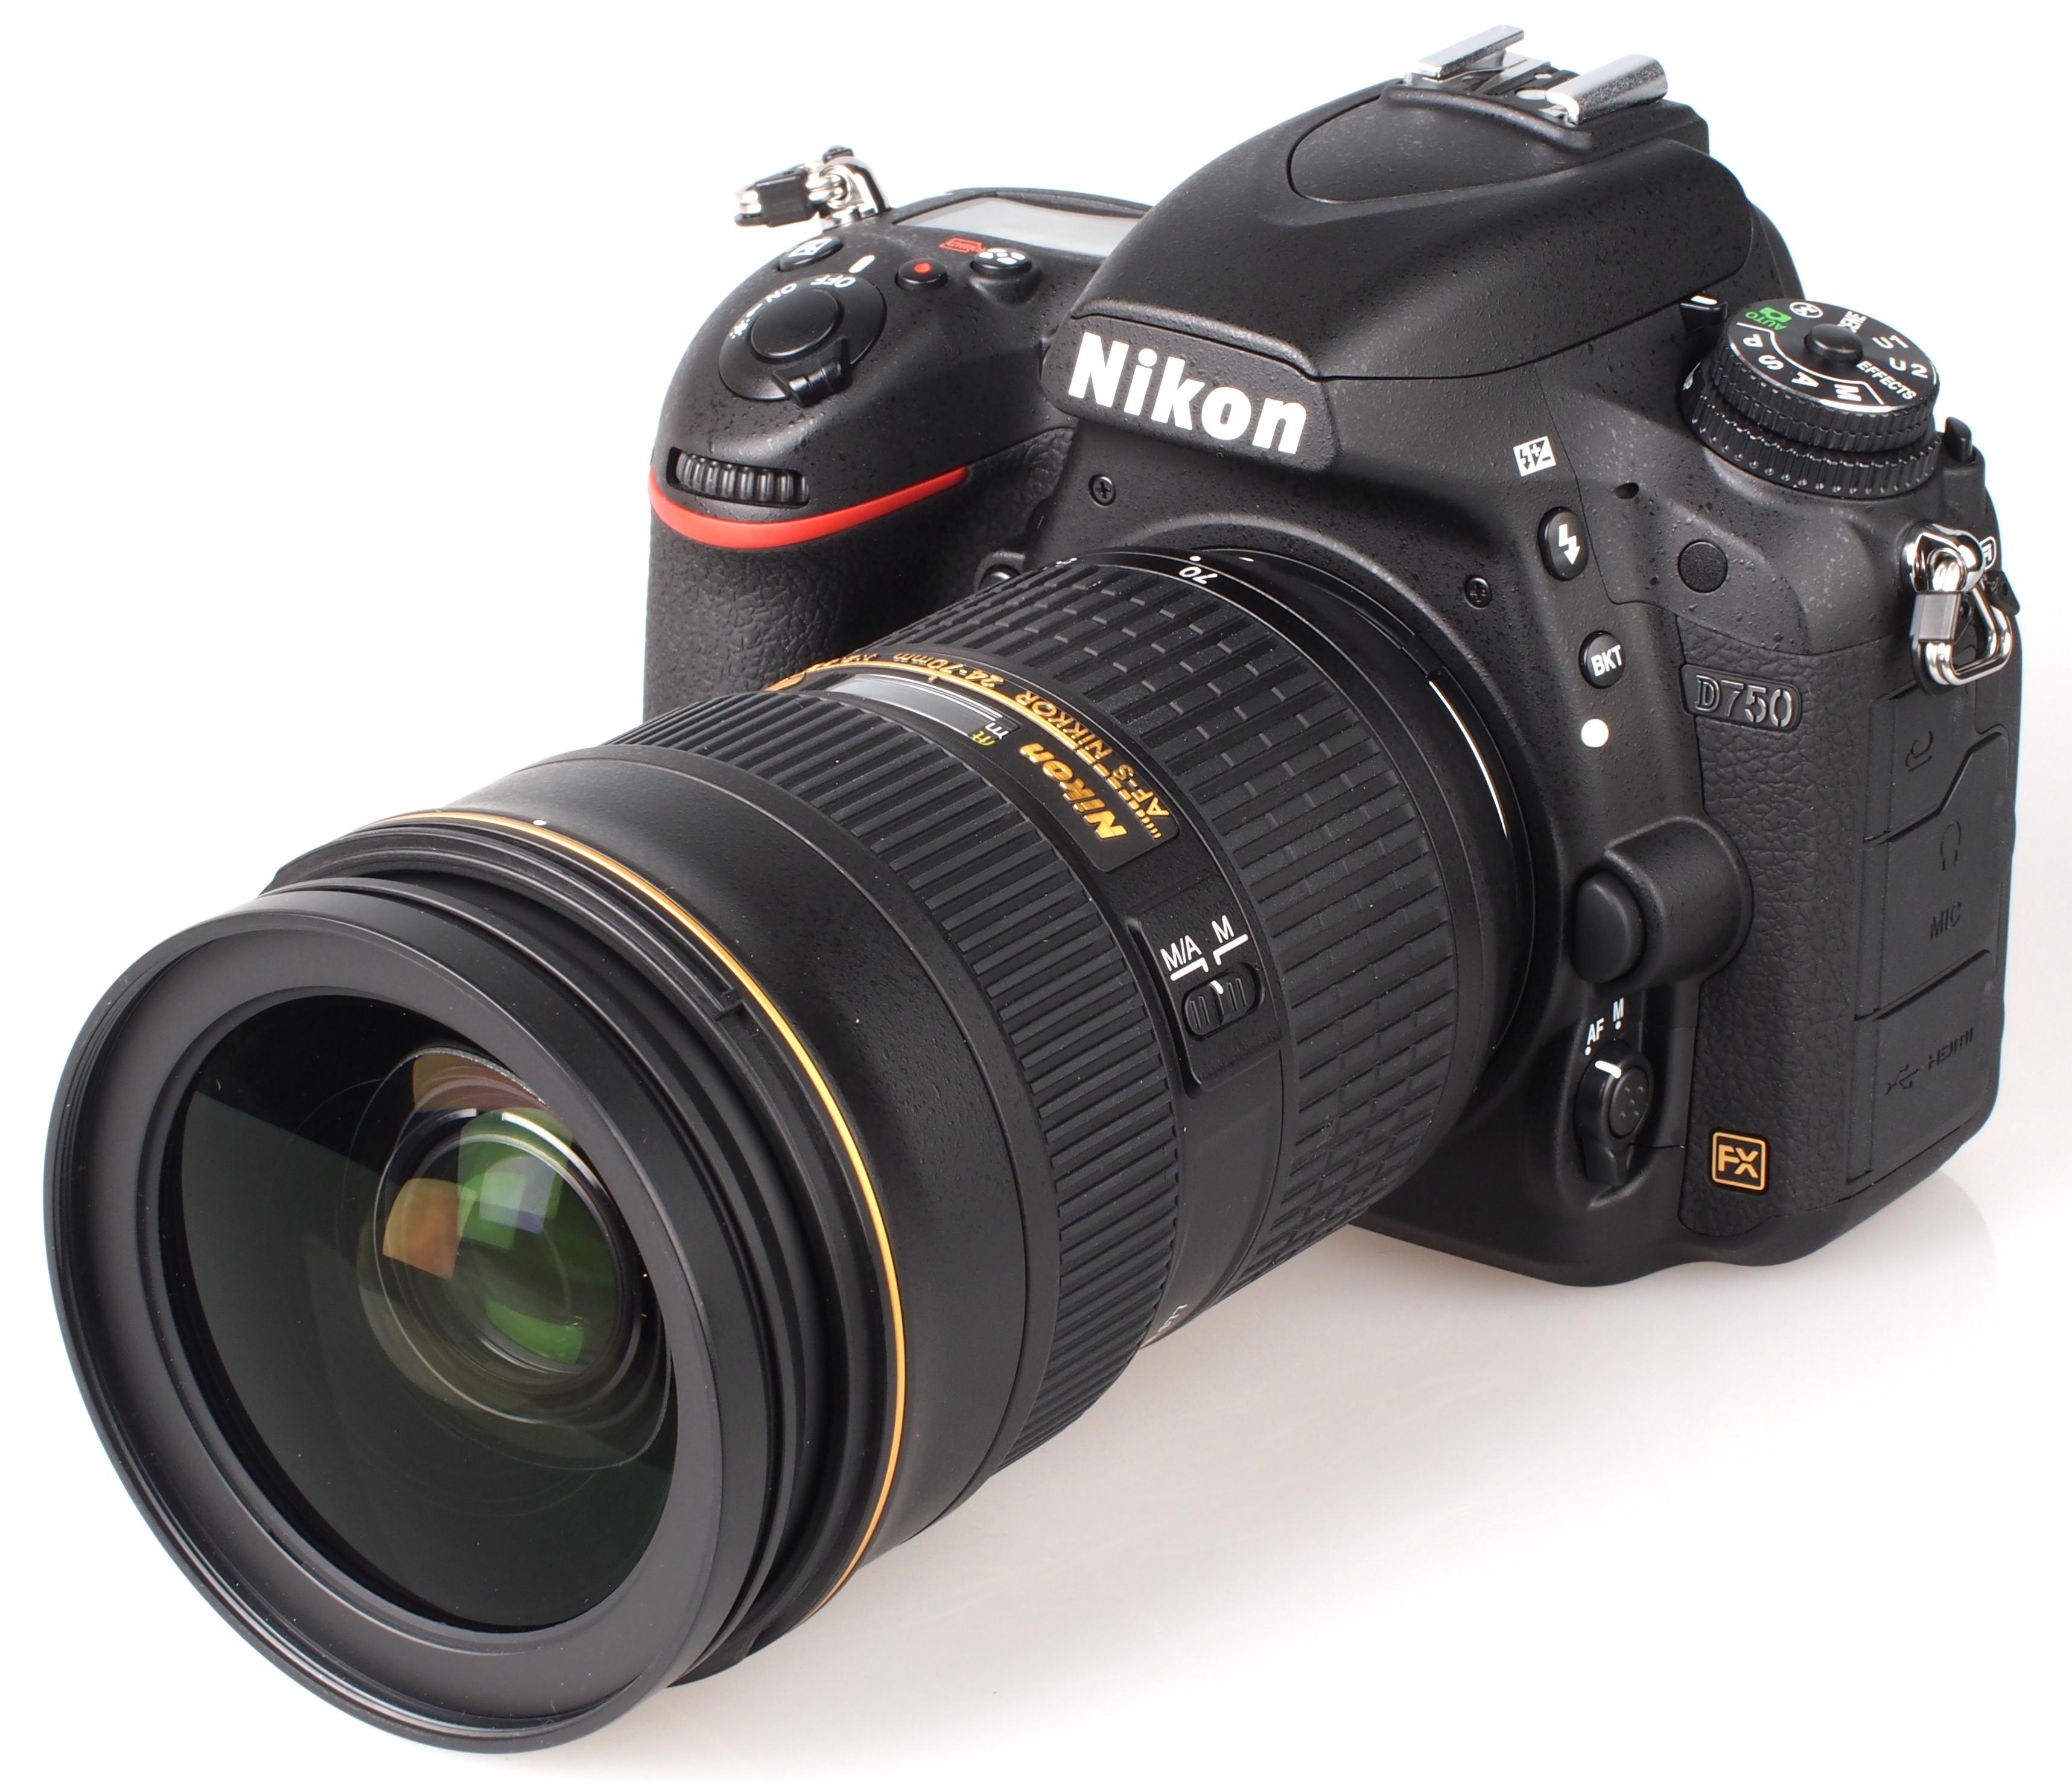 Nikon D750 Digital SLR Review | ePHOTOzine